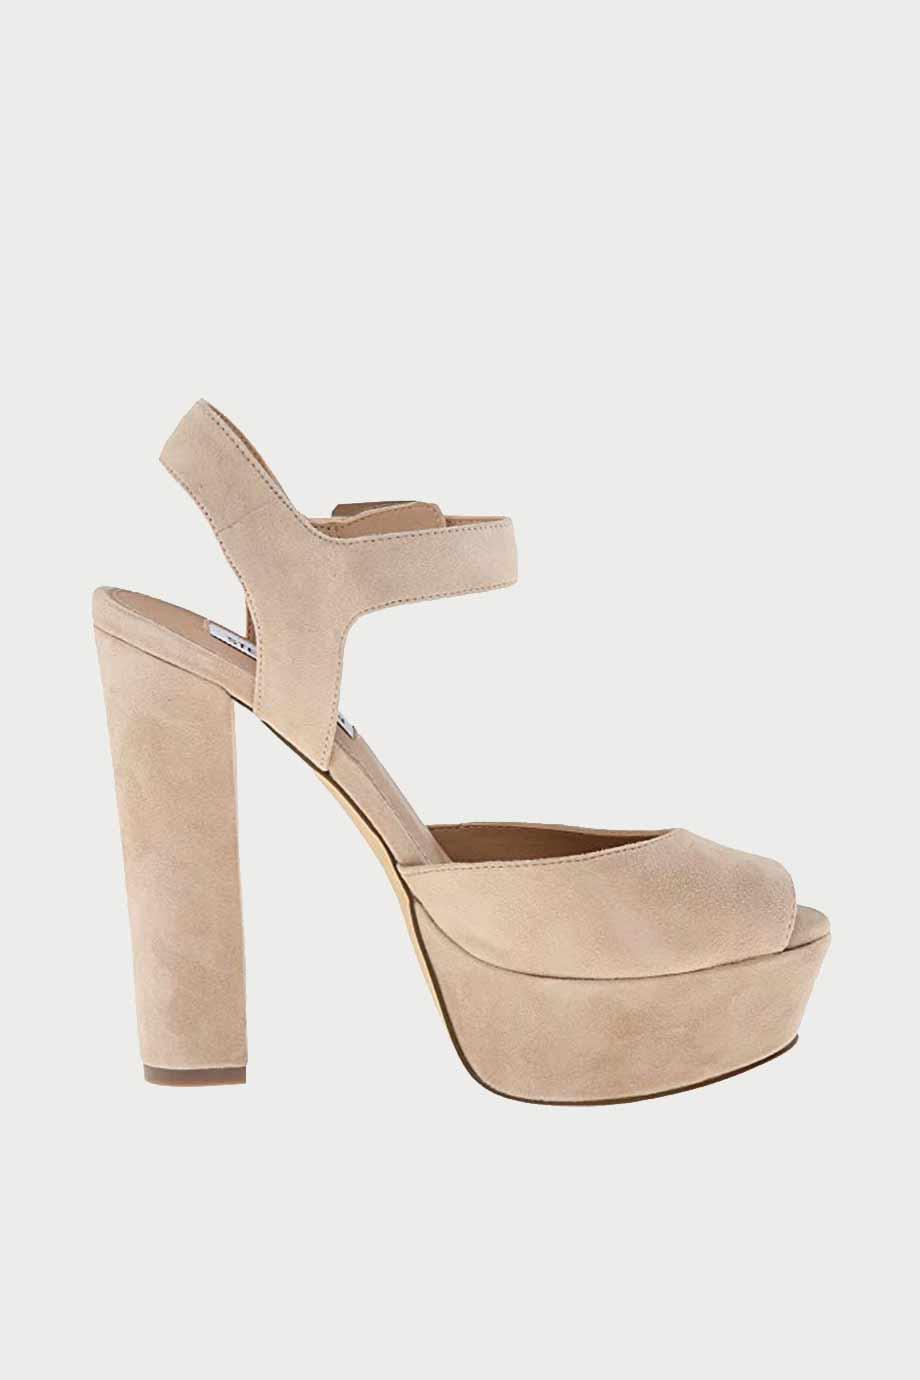 spiridoula metheniti shoes xalkida p Steve Madden 115744 Jillyy clarks blush suede 3